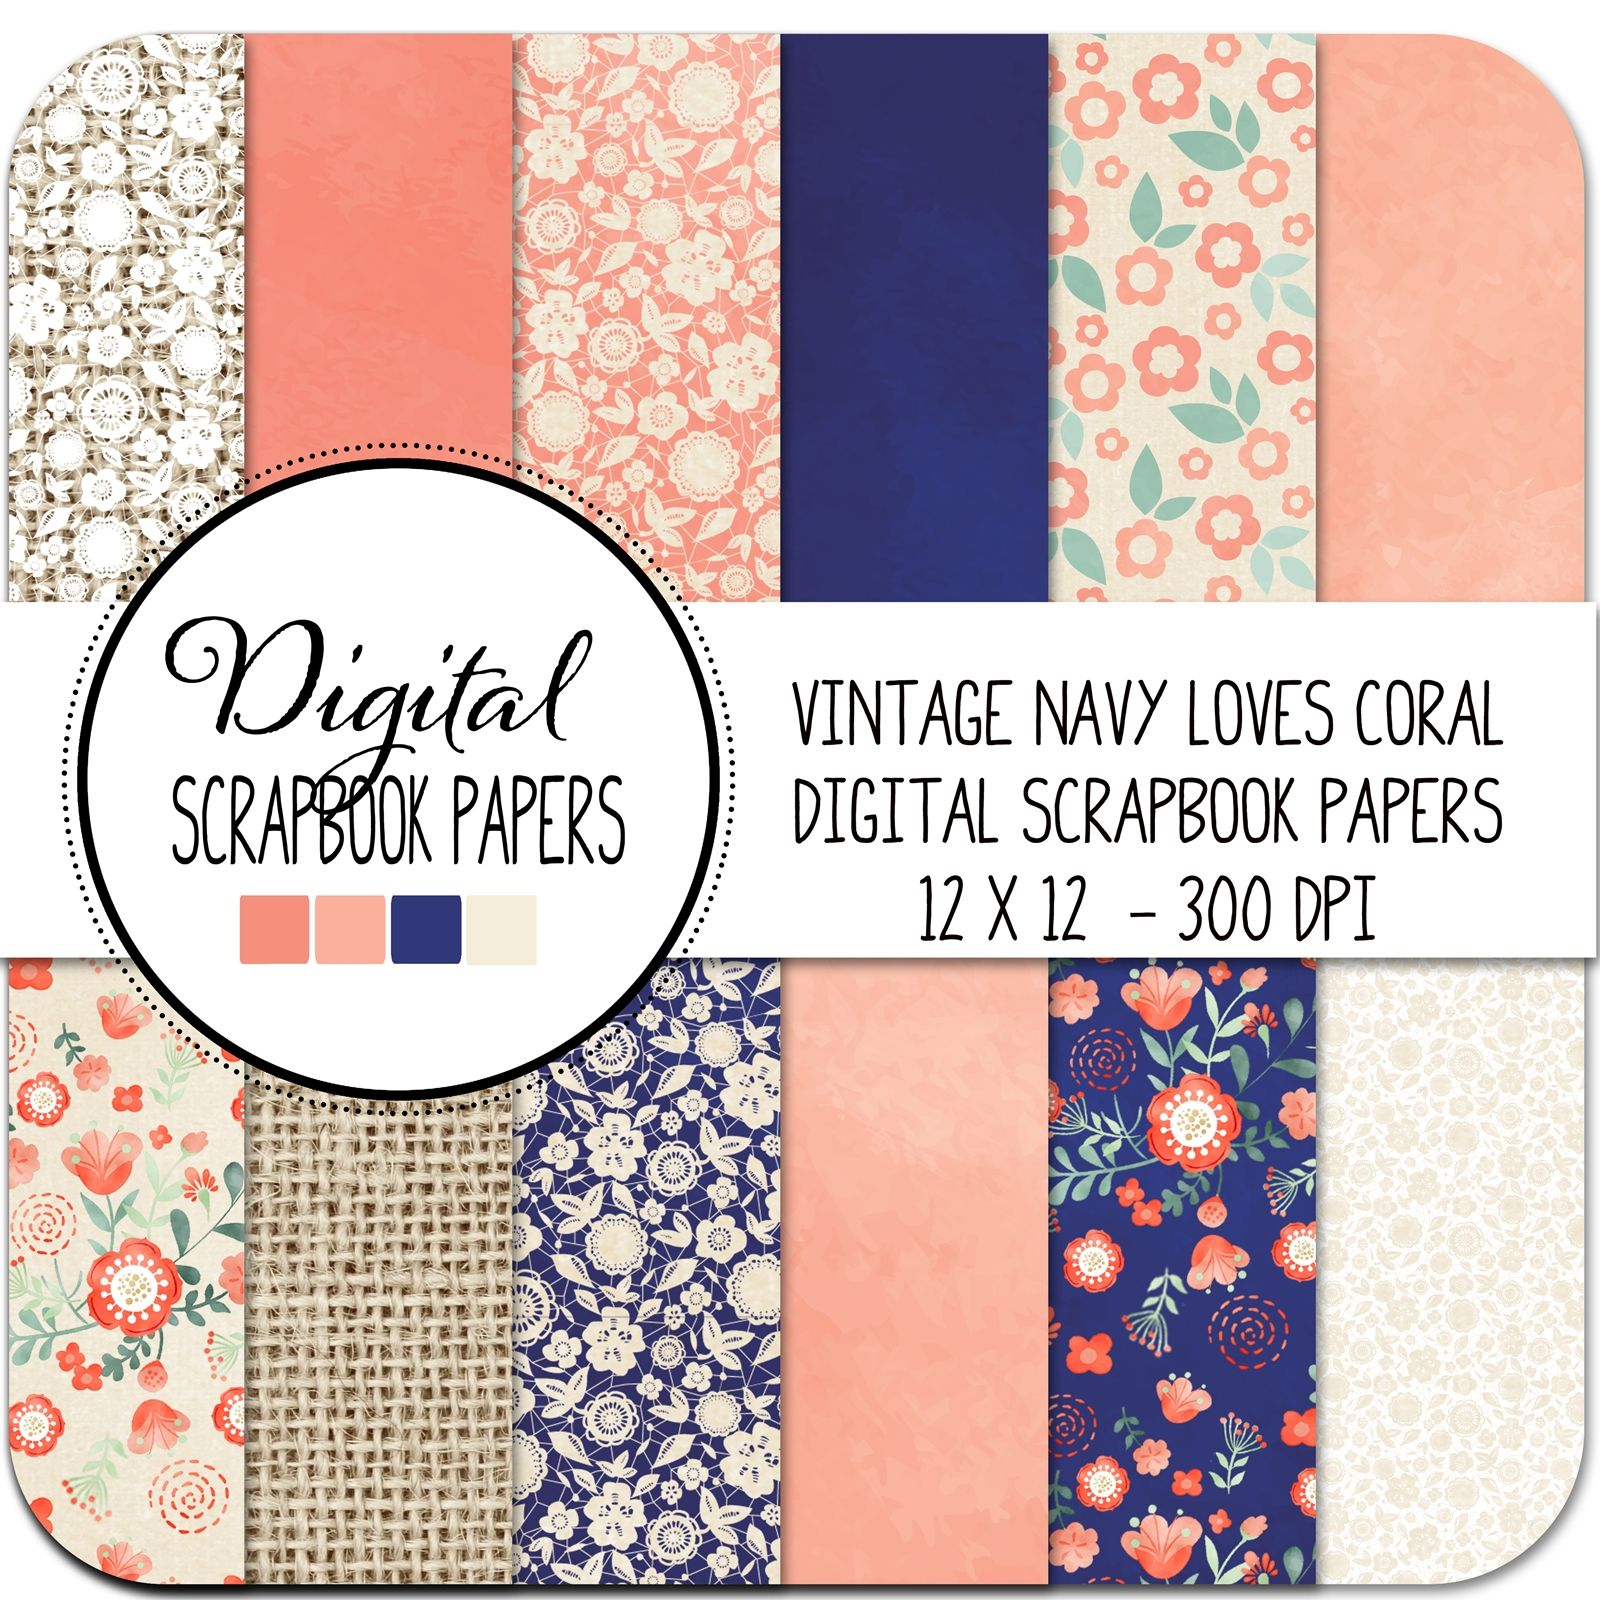 Scrapbook paper booklet - Navy Loves Coral Vintage Digital Scrapbook Papers Navy Coral Flowers Stars